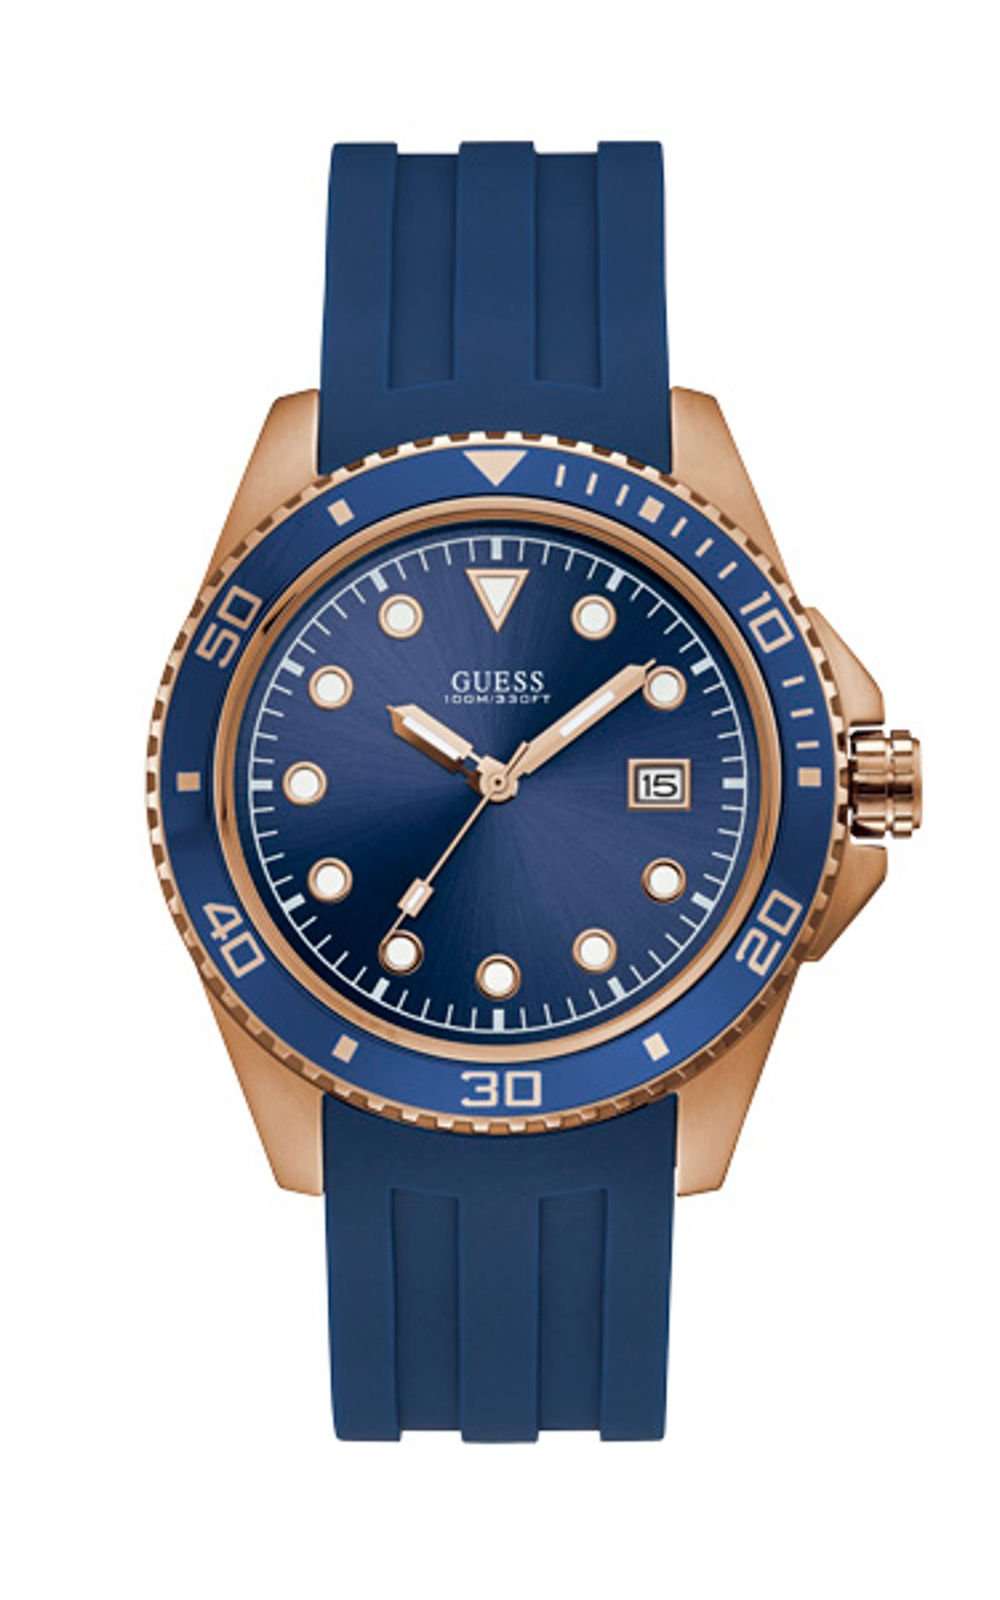 GUESS W1109G3 Ανδρικό Ρολόι Quartz Ακριβείας